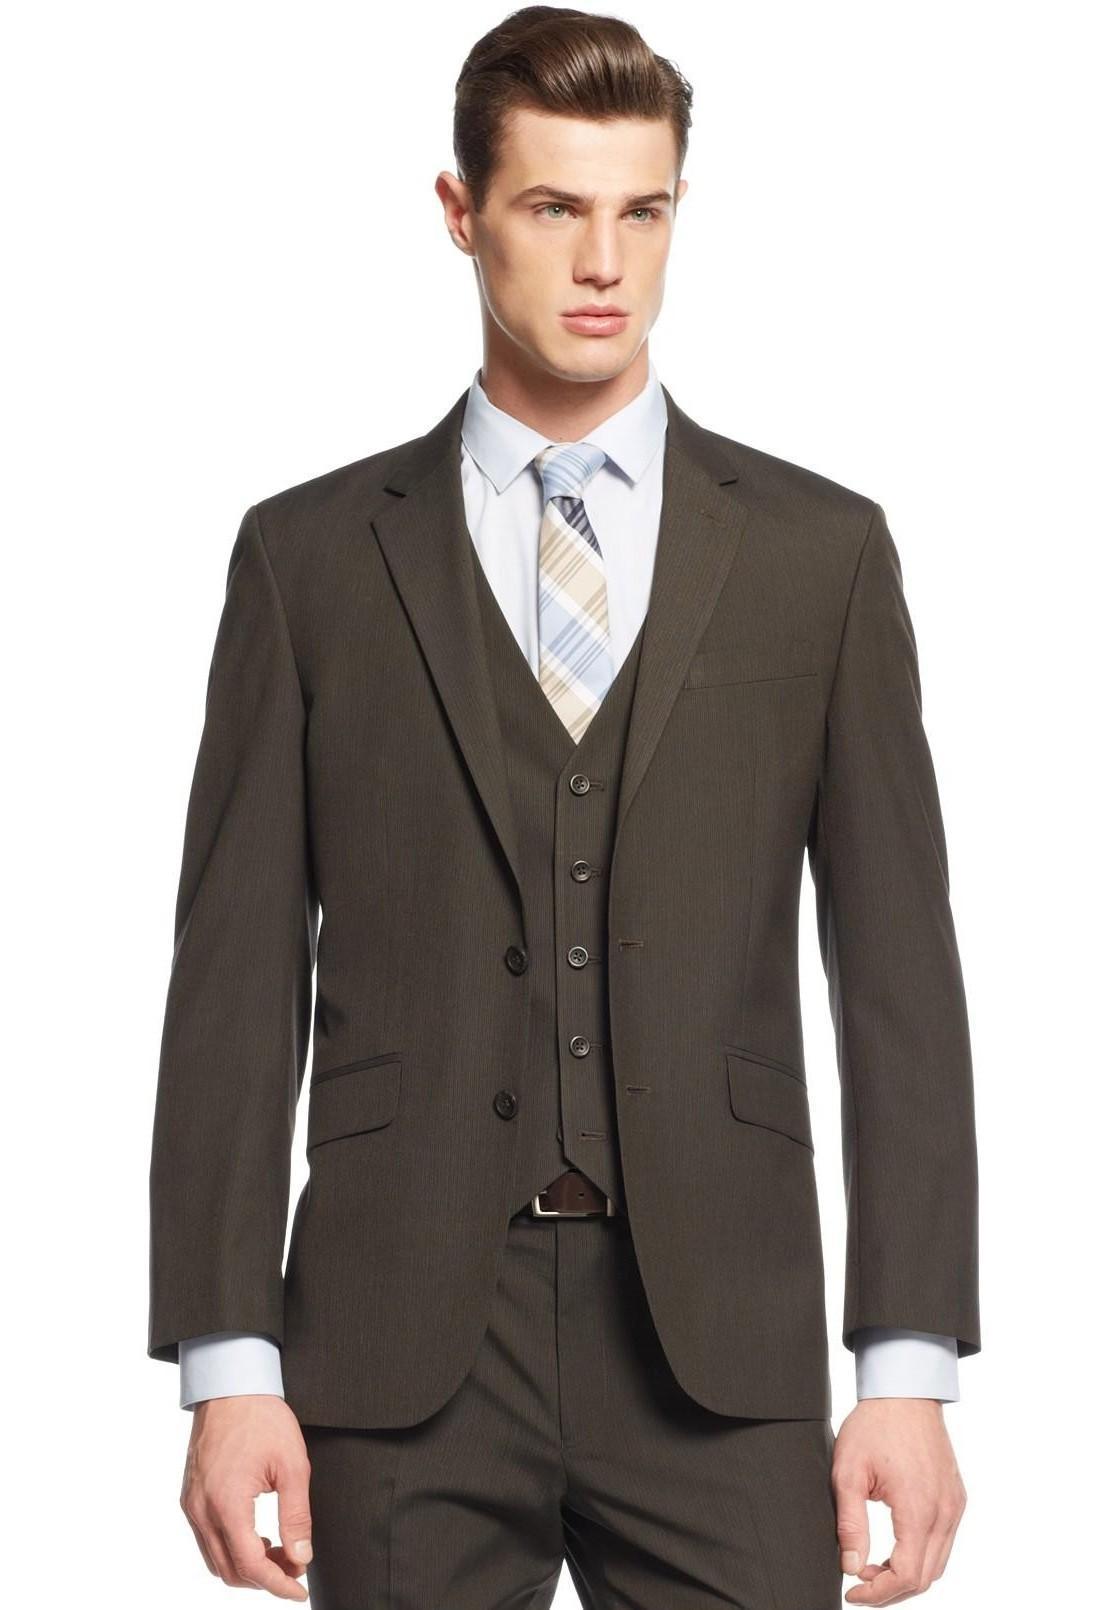 Custom Made New Style Noivo Smoking Notch Lapel dos homens Terno Escuro Marrom Groomsman / Noivo Casamento / Prom Ternos Jacket + Pants + Tie + Vest v001